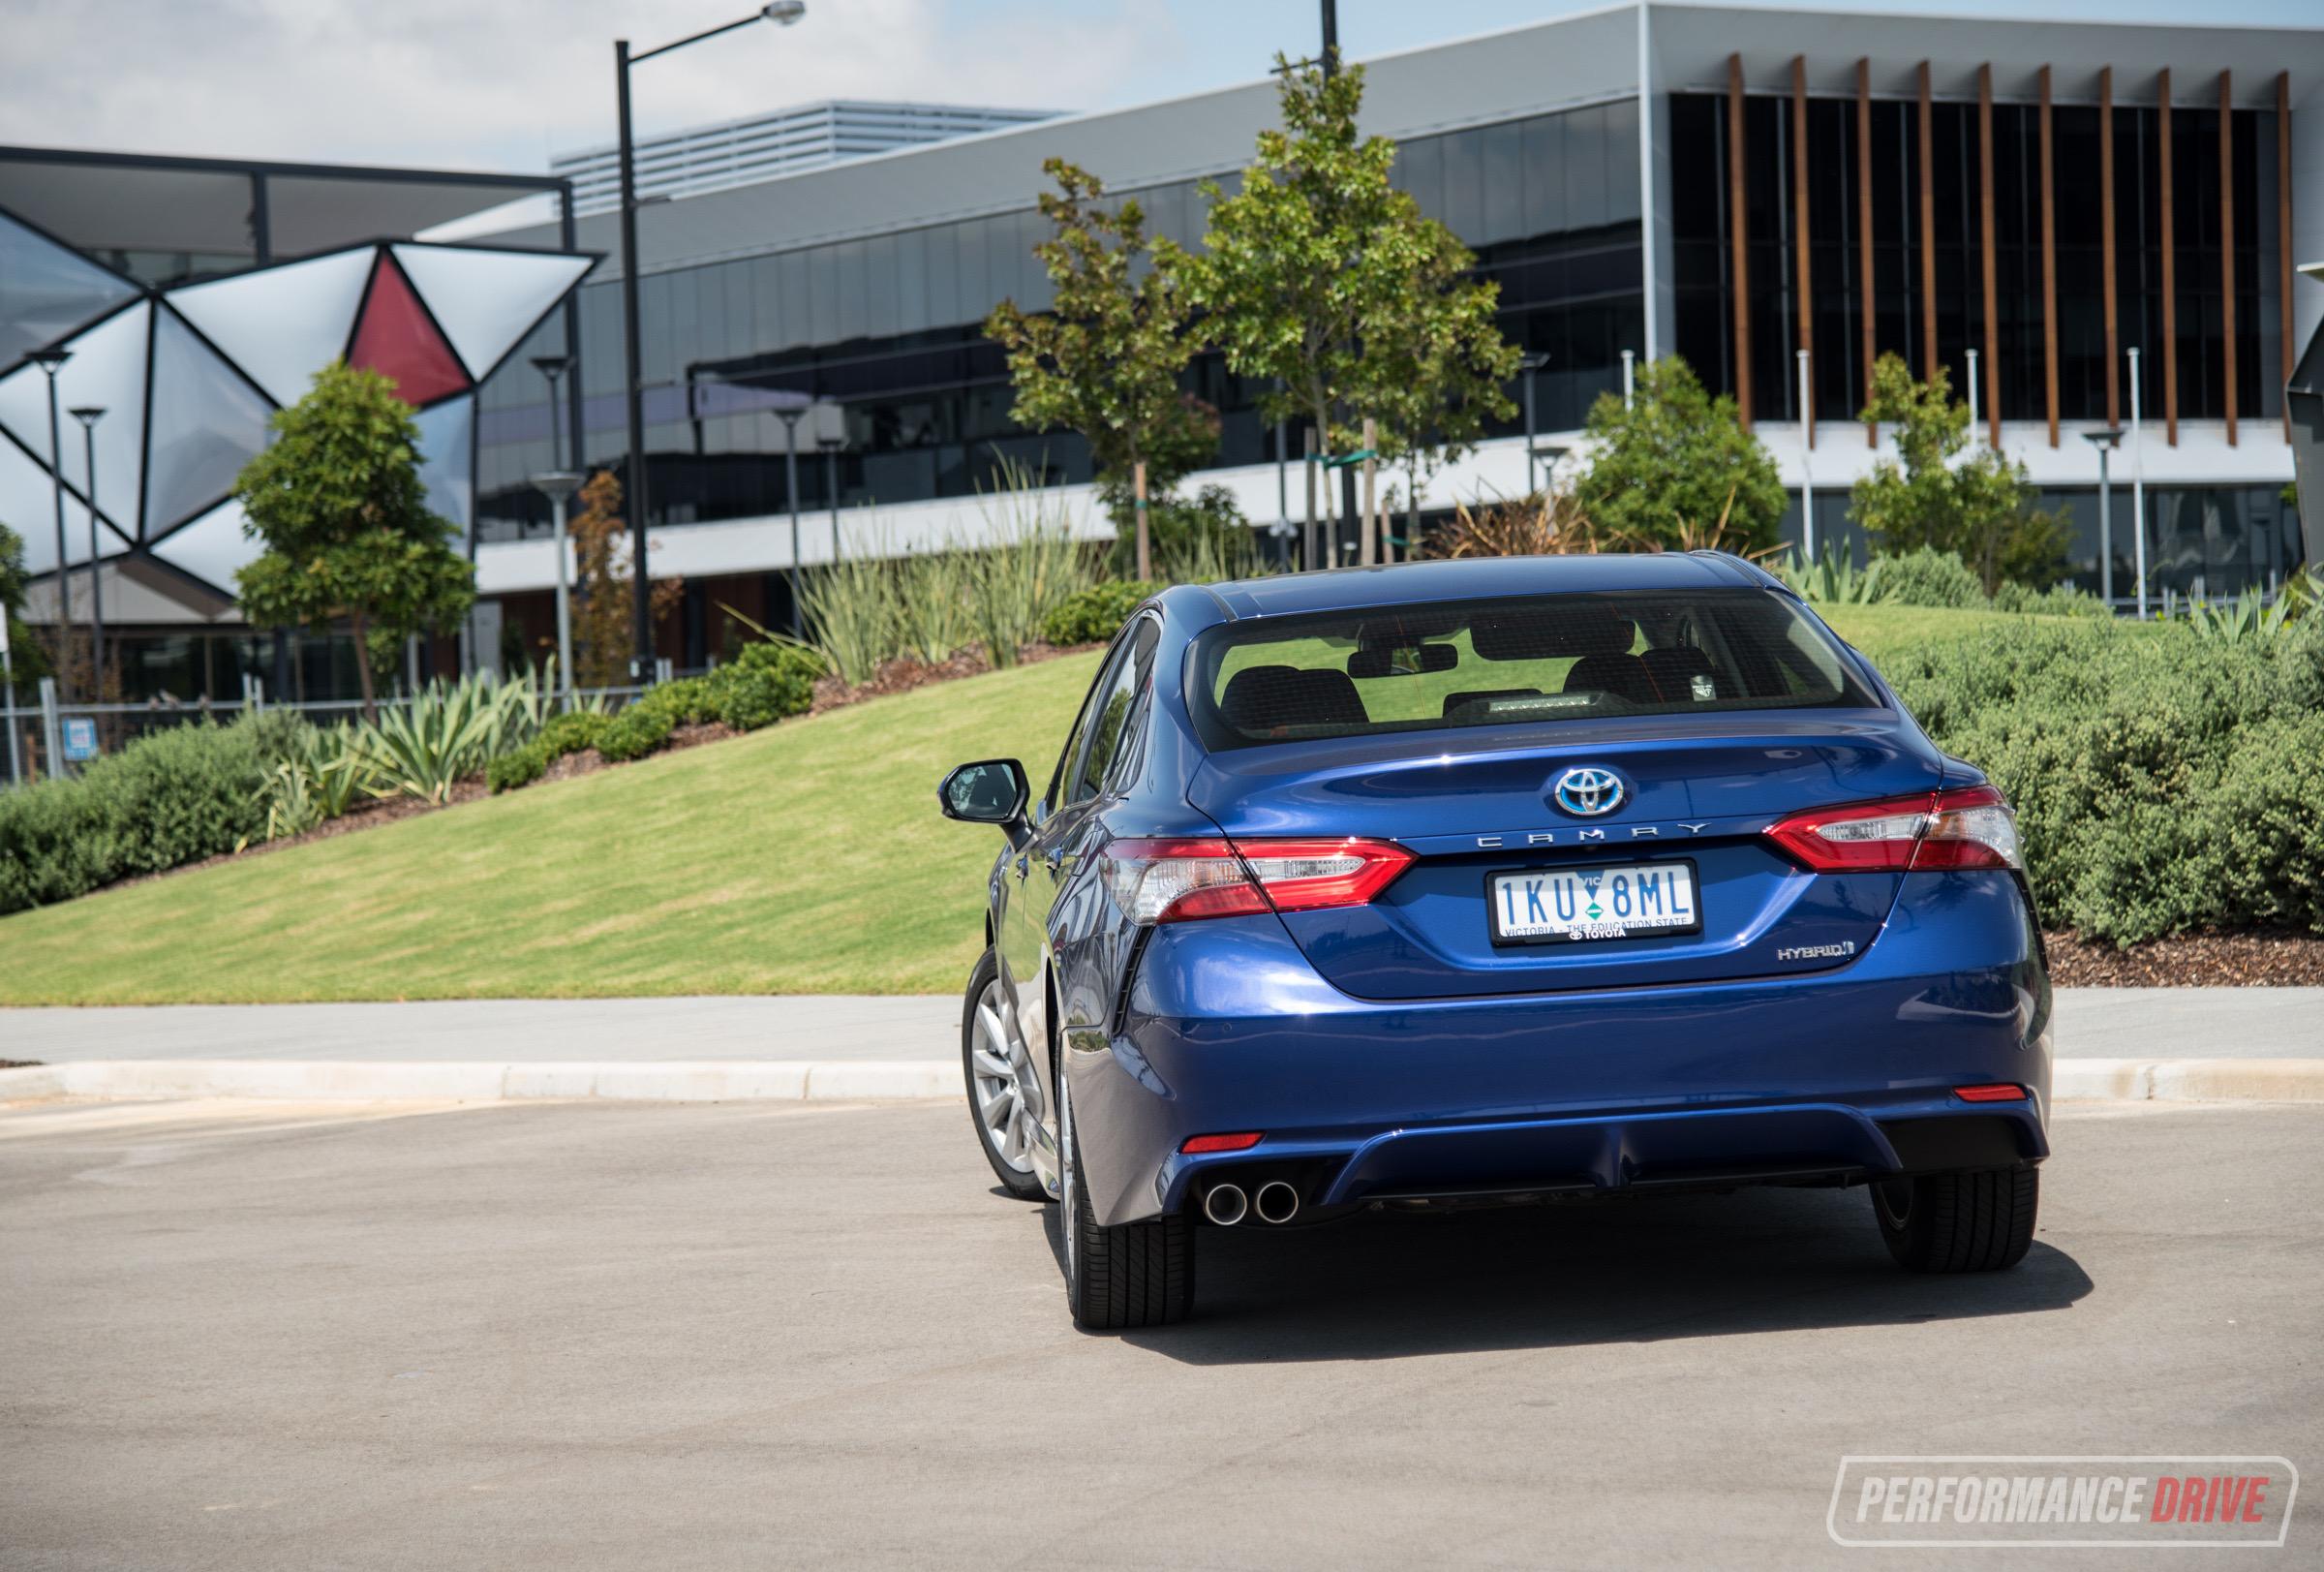 2018 Toyota Camry Hybrid review (video) | PerformanceDrive